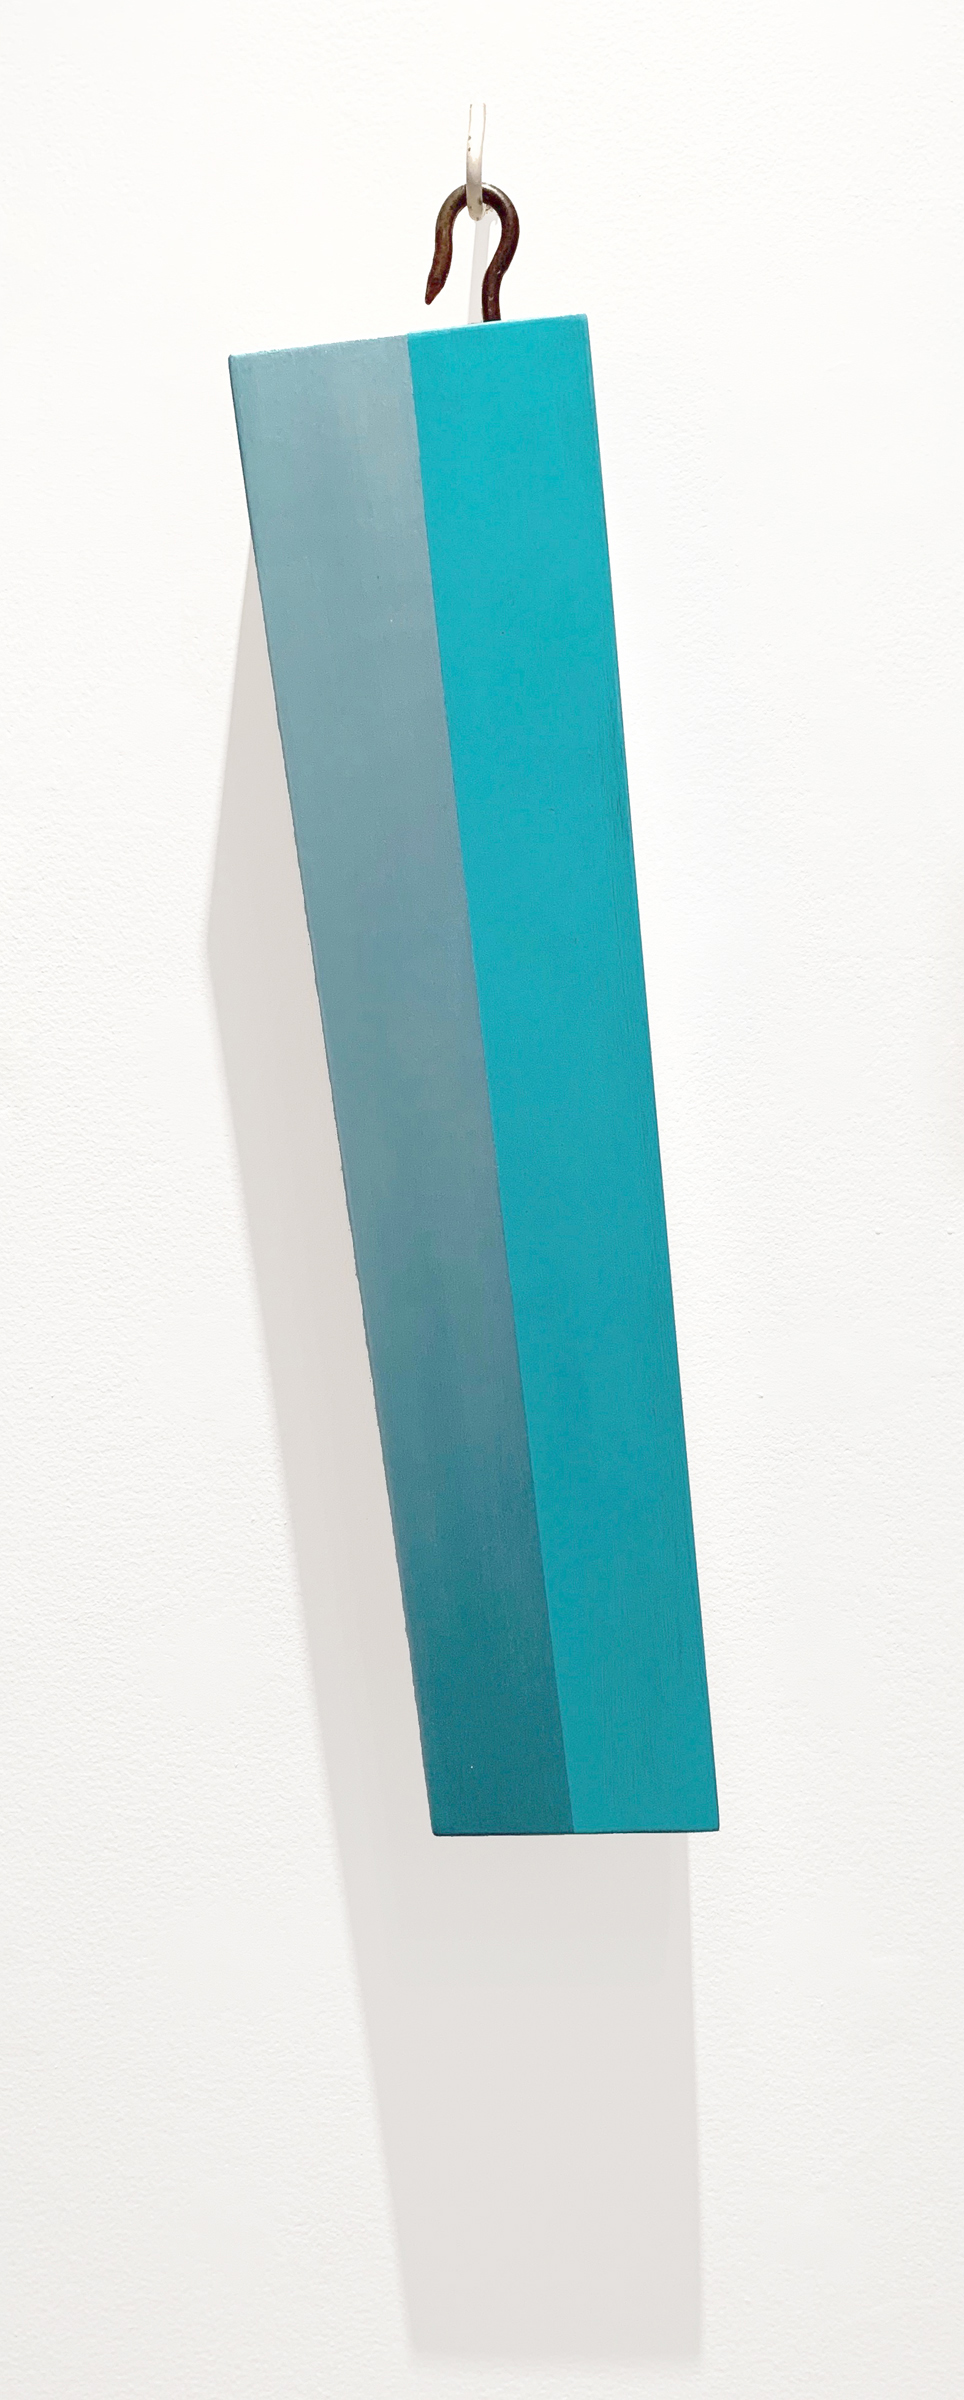 Lost and Found #2, 29 x 5.75 x 4 inches / 73.5 x 14.5 x 10 cm, acrylic on poplar, 2019